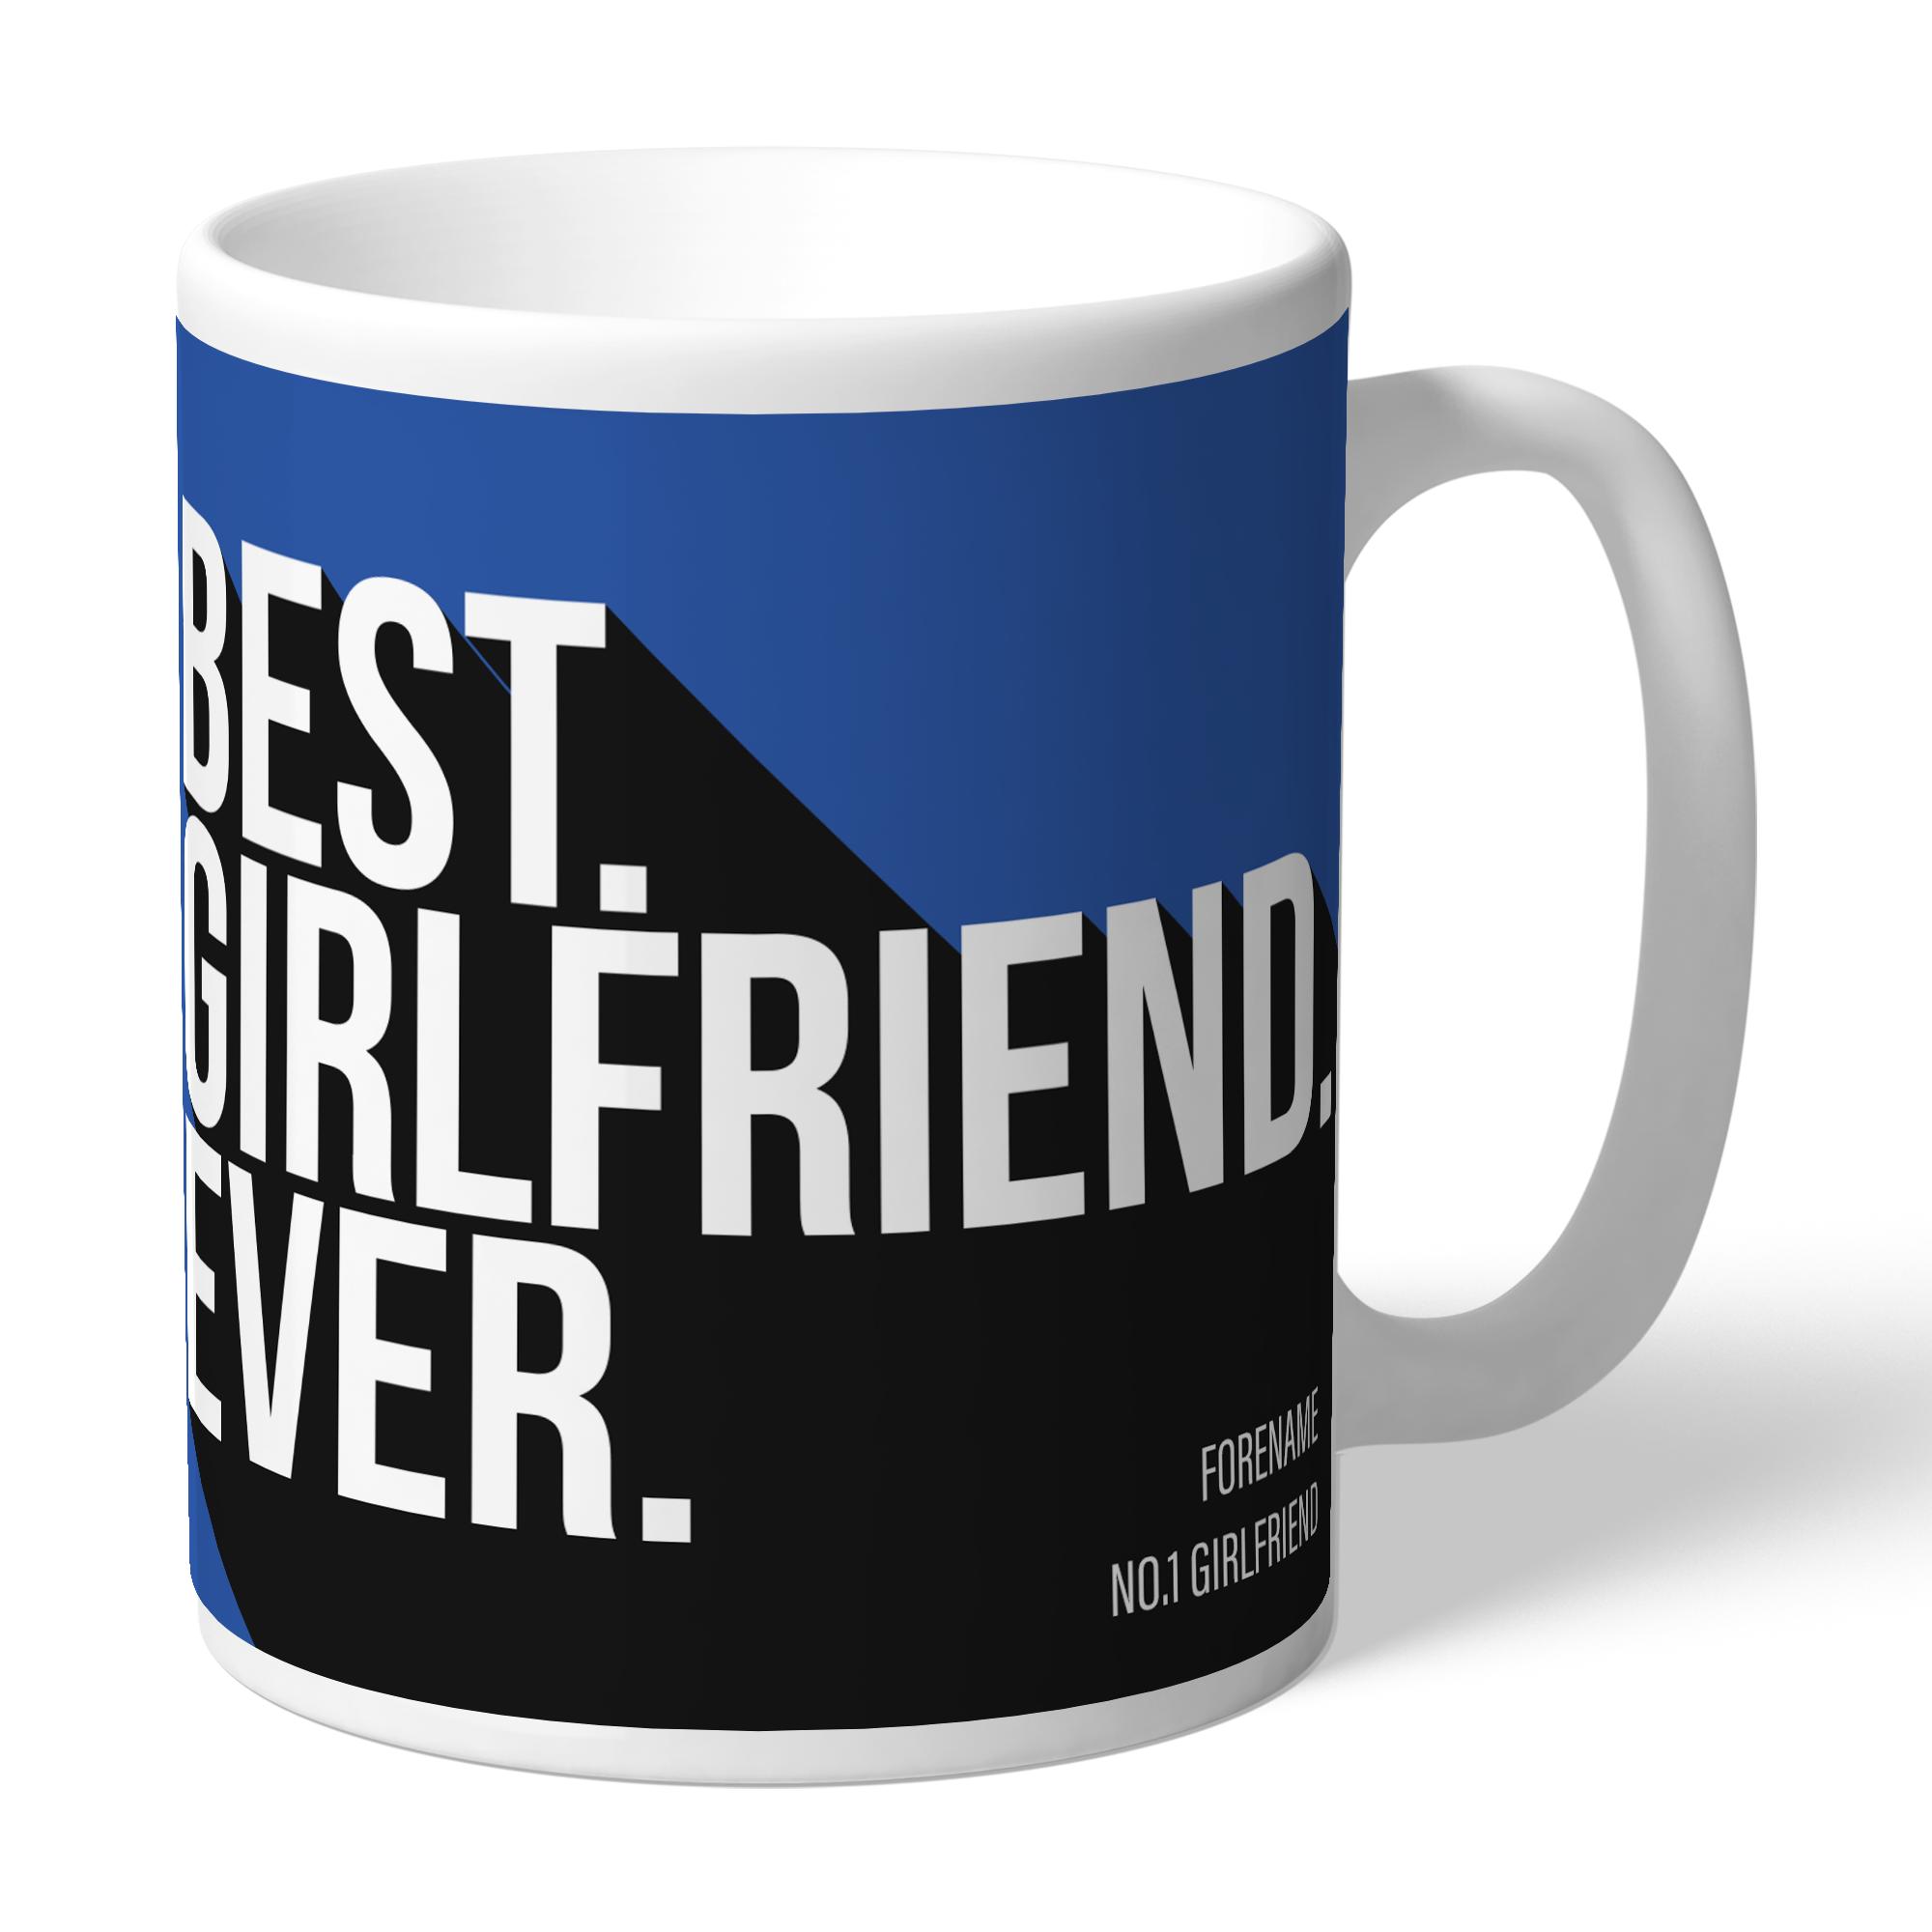 Sheffield Wednesday Best Girlfriend Ever Mug